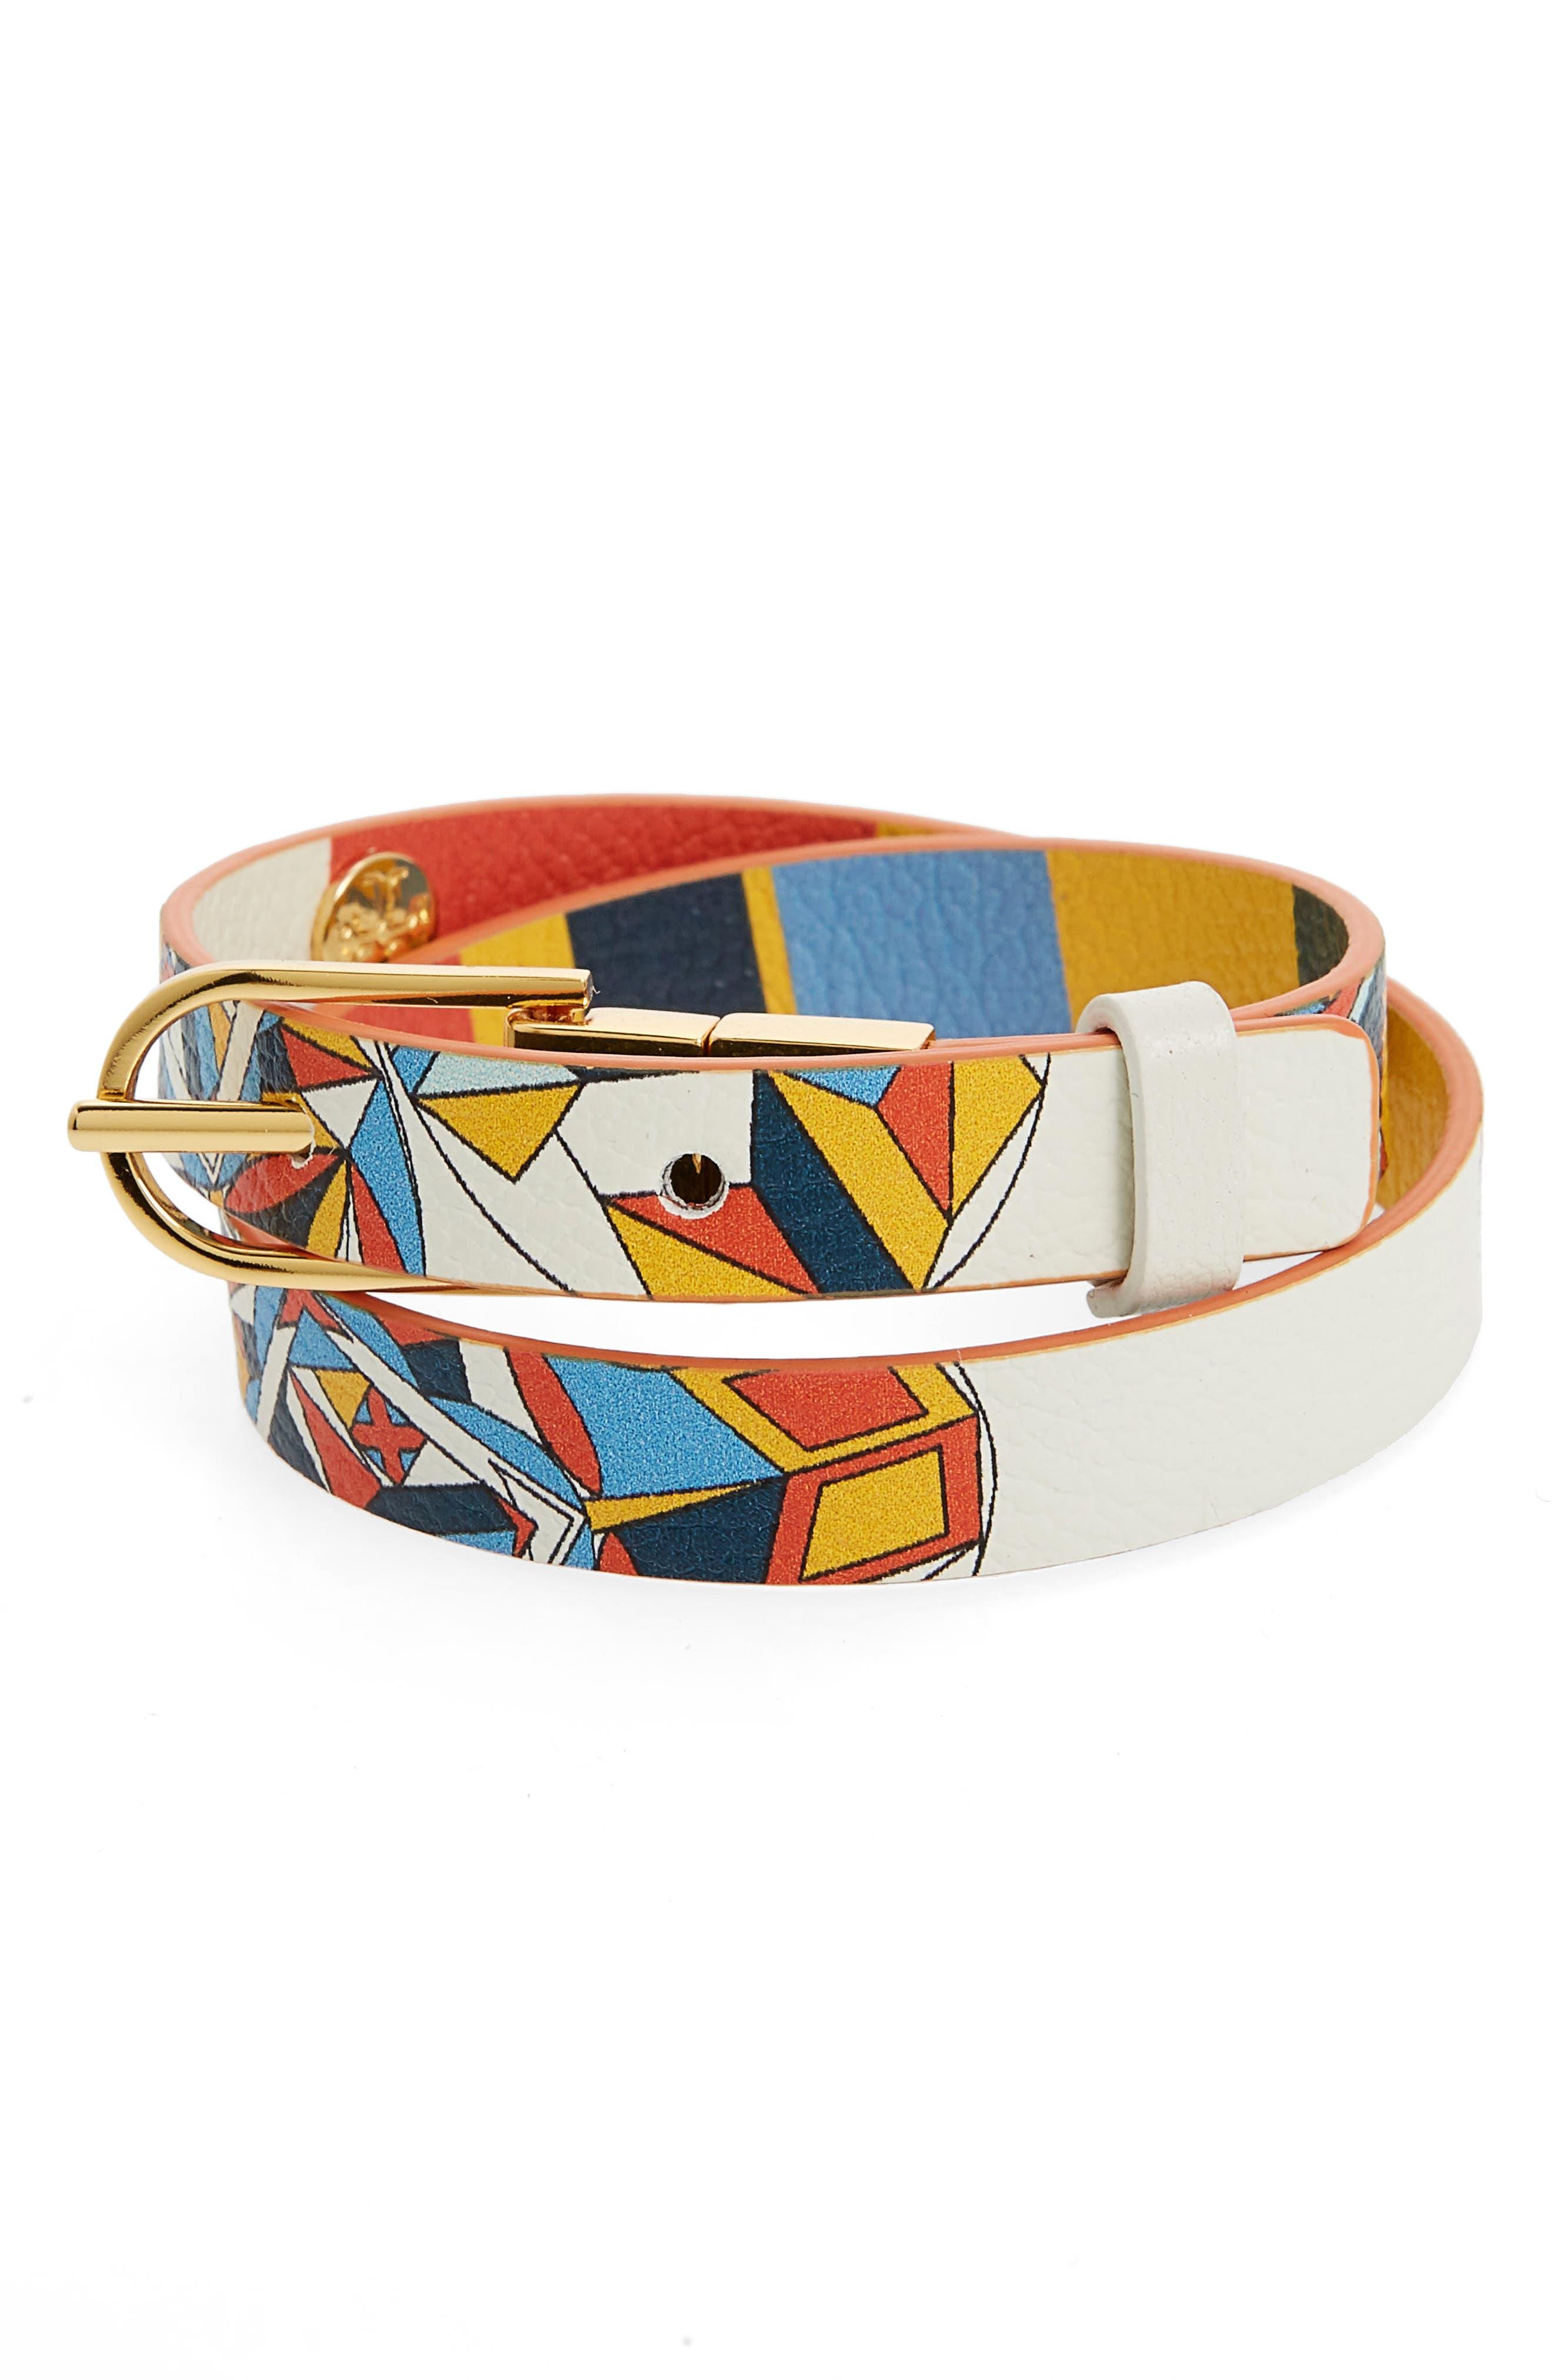 Tory Burch Reversible Leather Double Wrap Bracelet